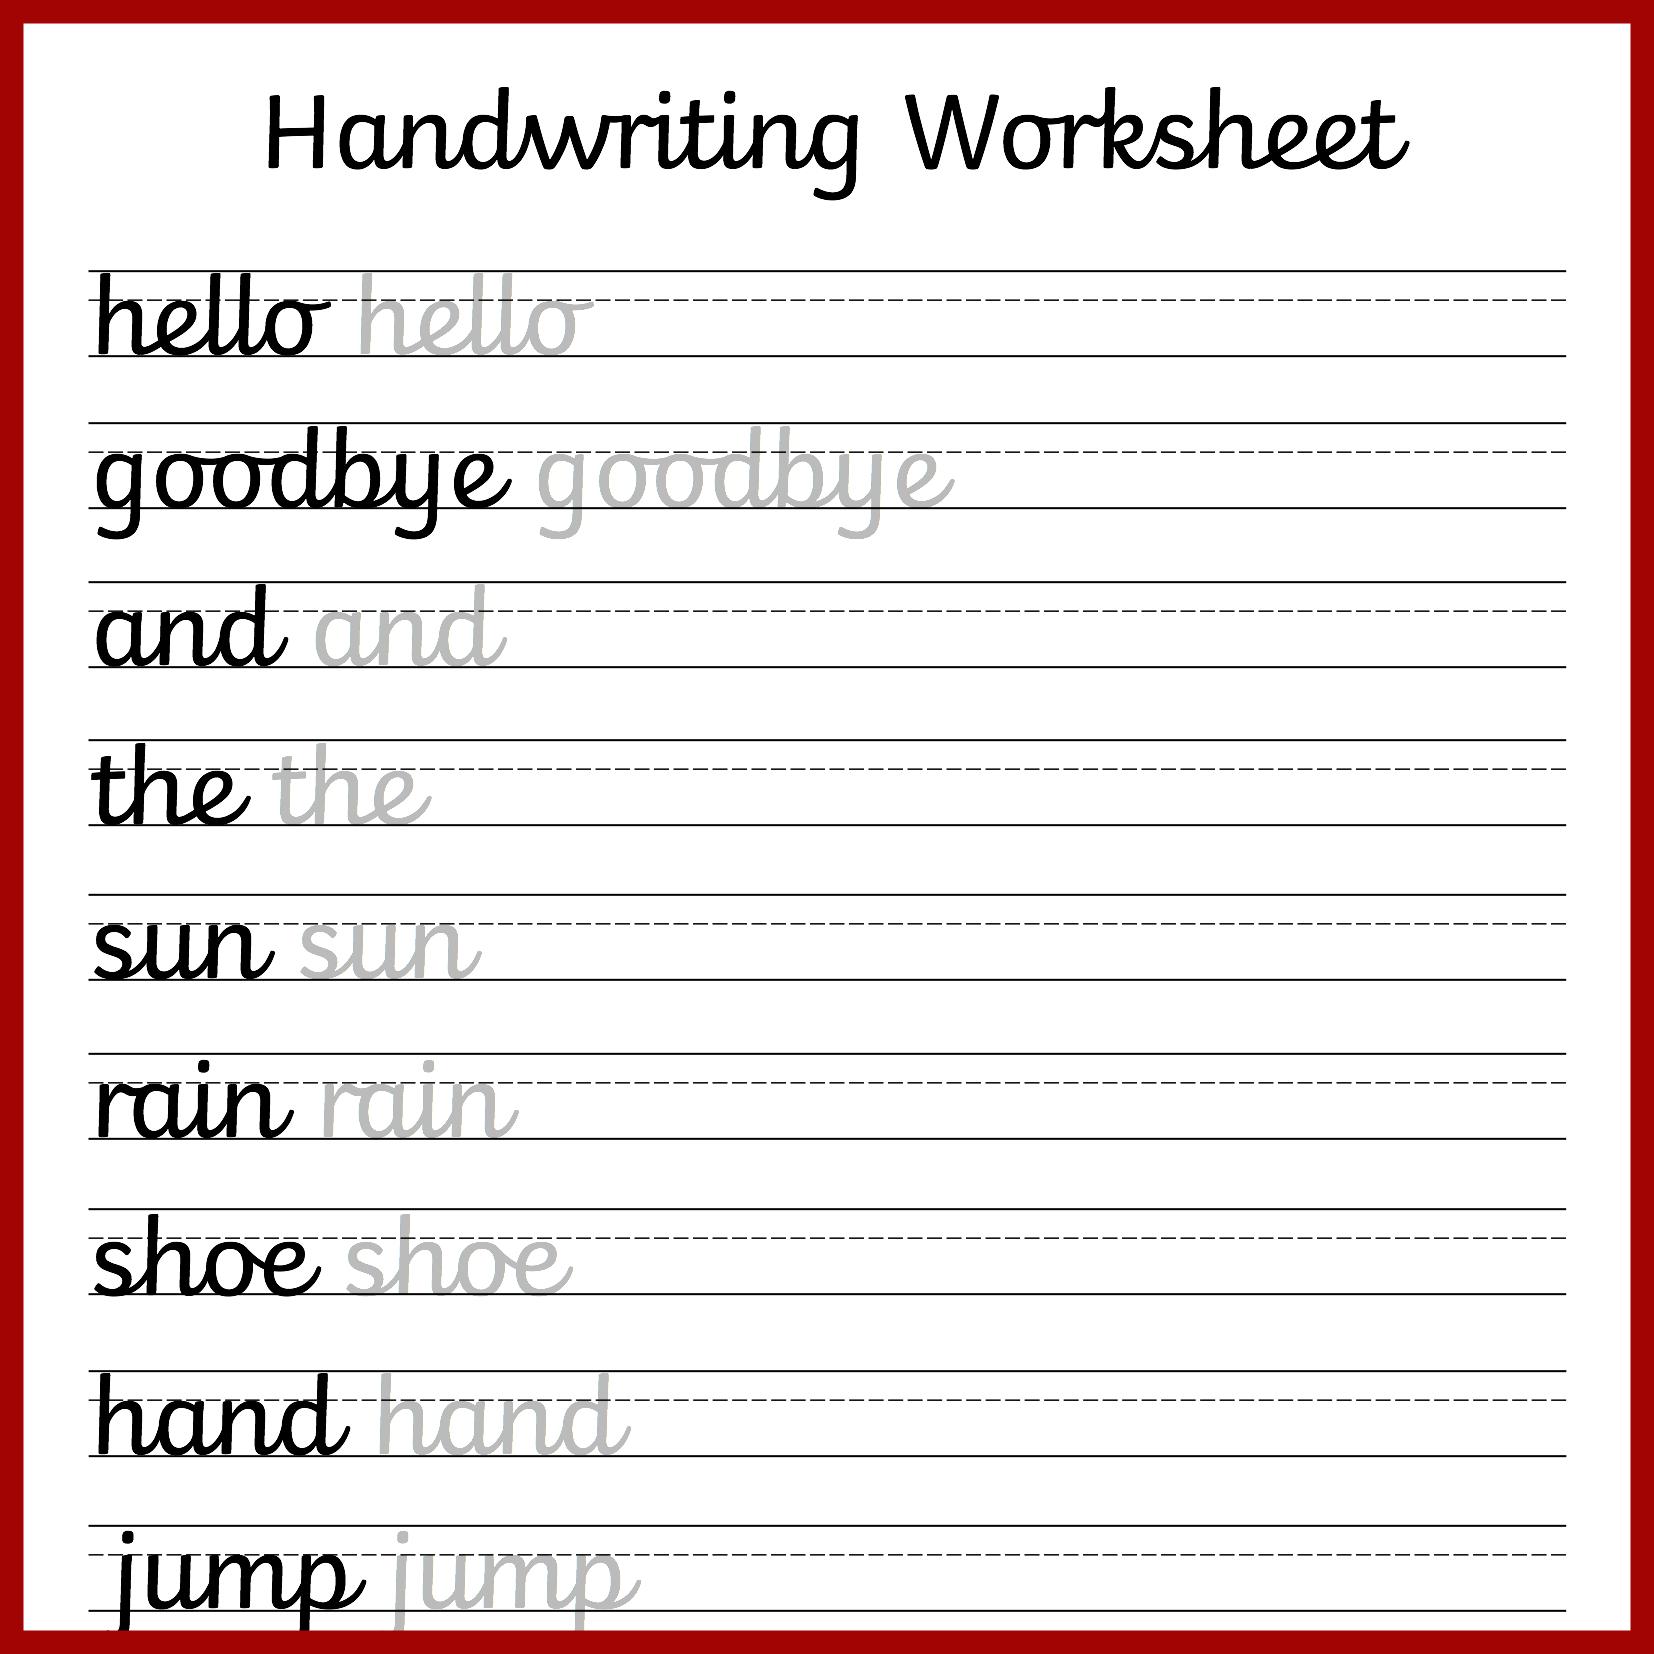 Cursive Handwriting Worksheets – Free Printable! ⋆ Mama Geek - Make Your Own Worksheets Free Printable